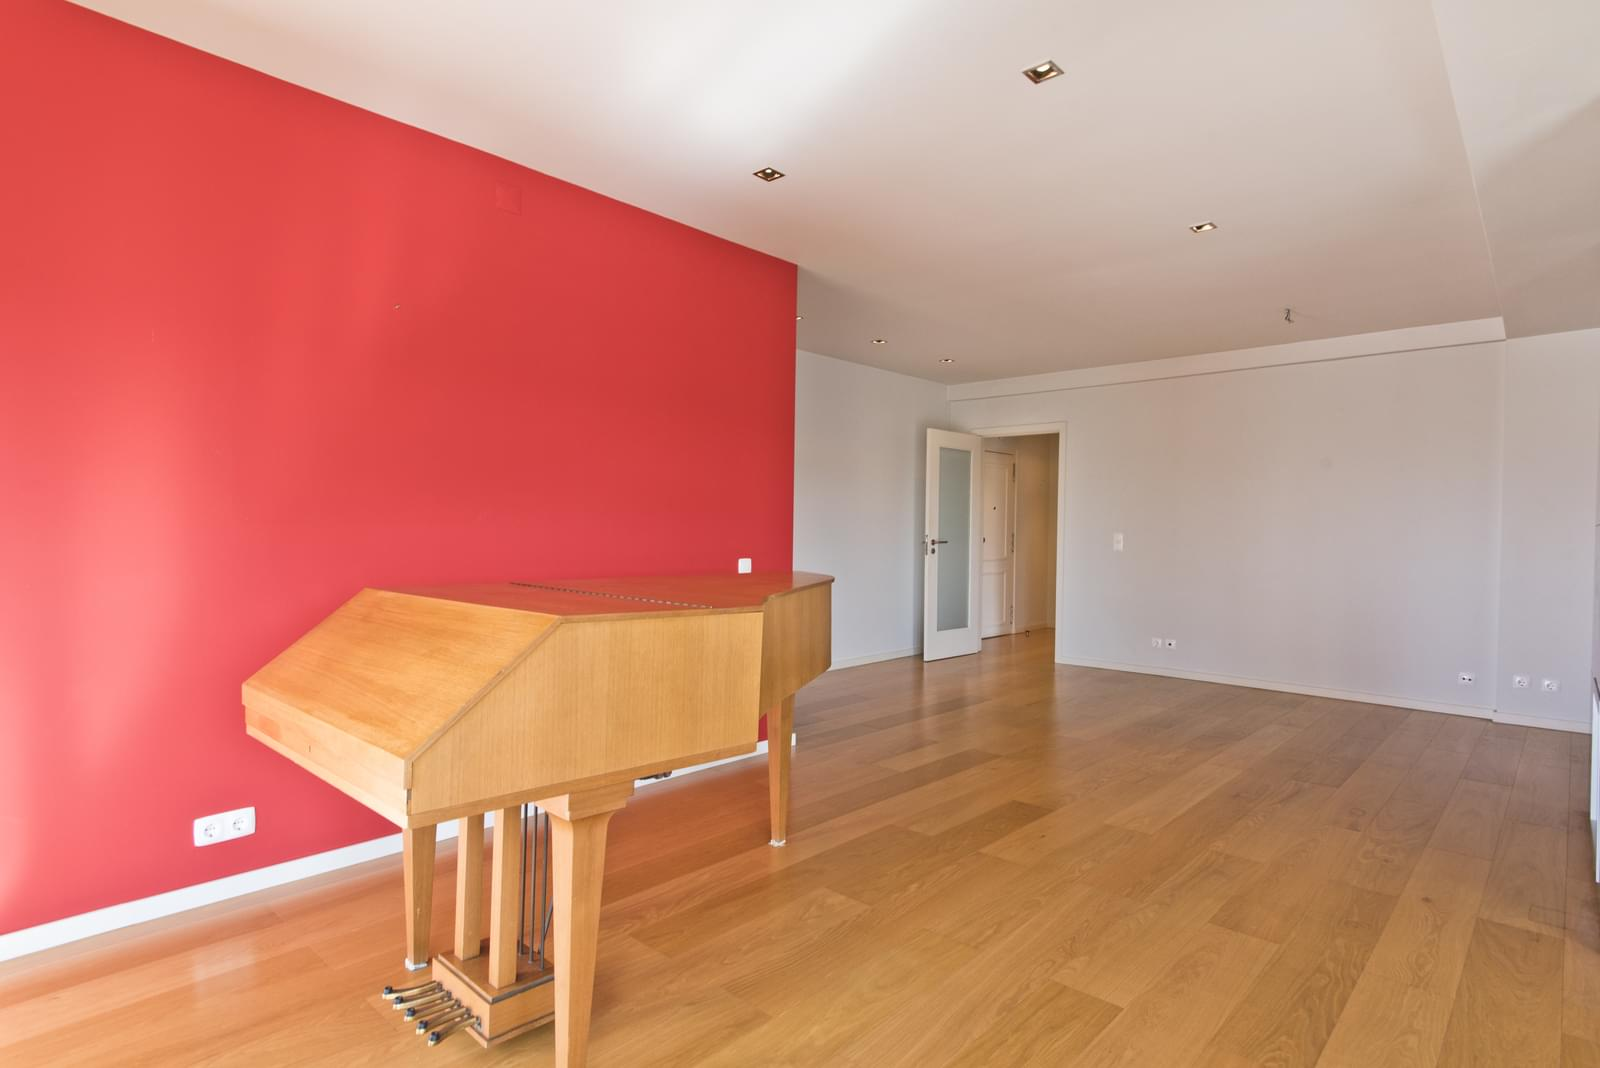 pf17006-apartamento-t1-cascais-0b702b54-a680-4032-8e4d-06d0f5c4a35b